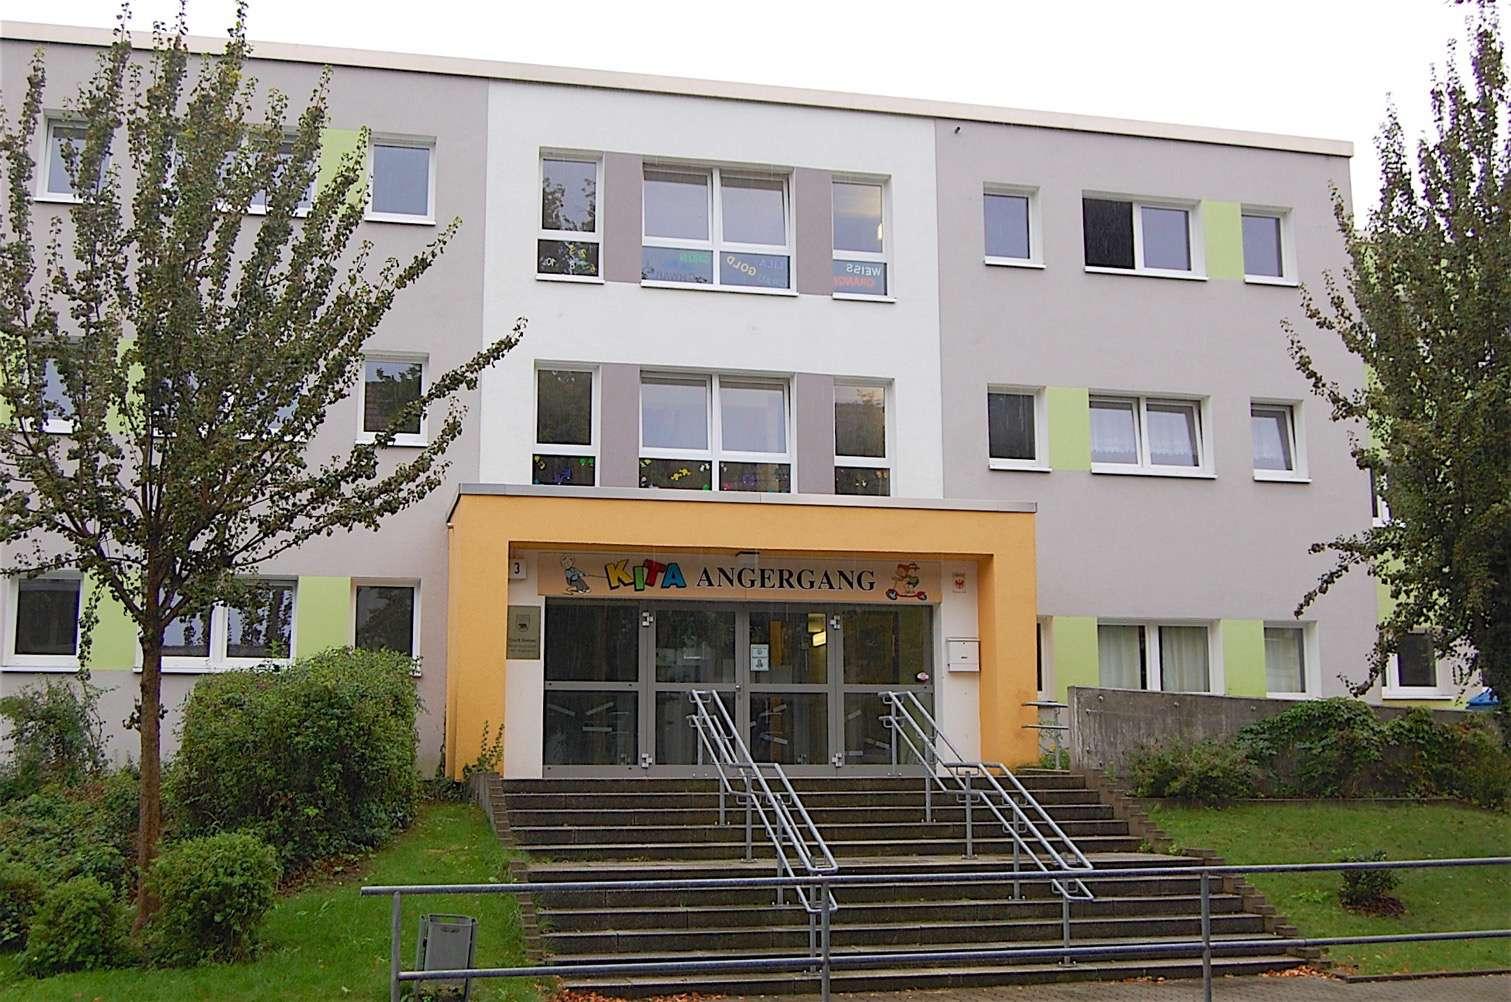 "Die Kita ""Angergang"" in Bernau wird umfangreich saniert"